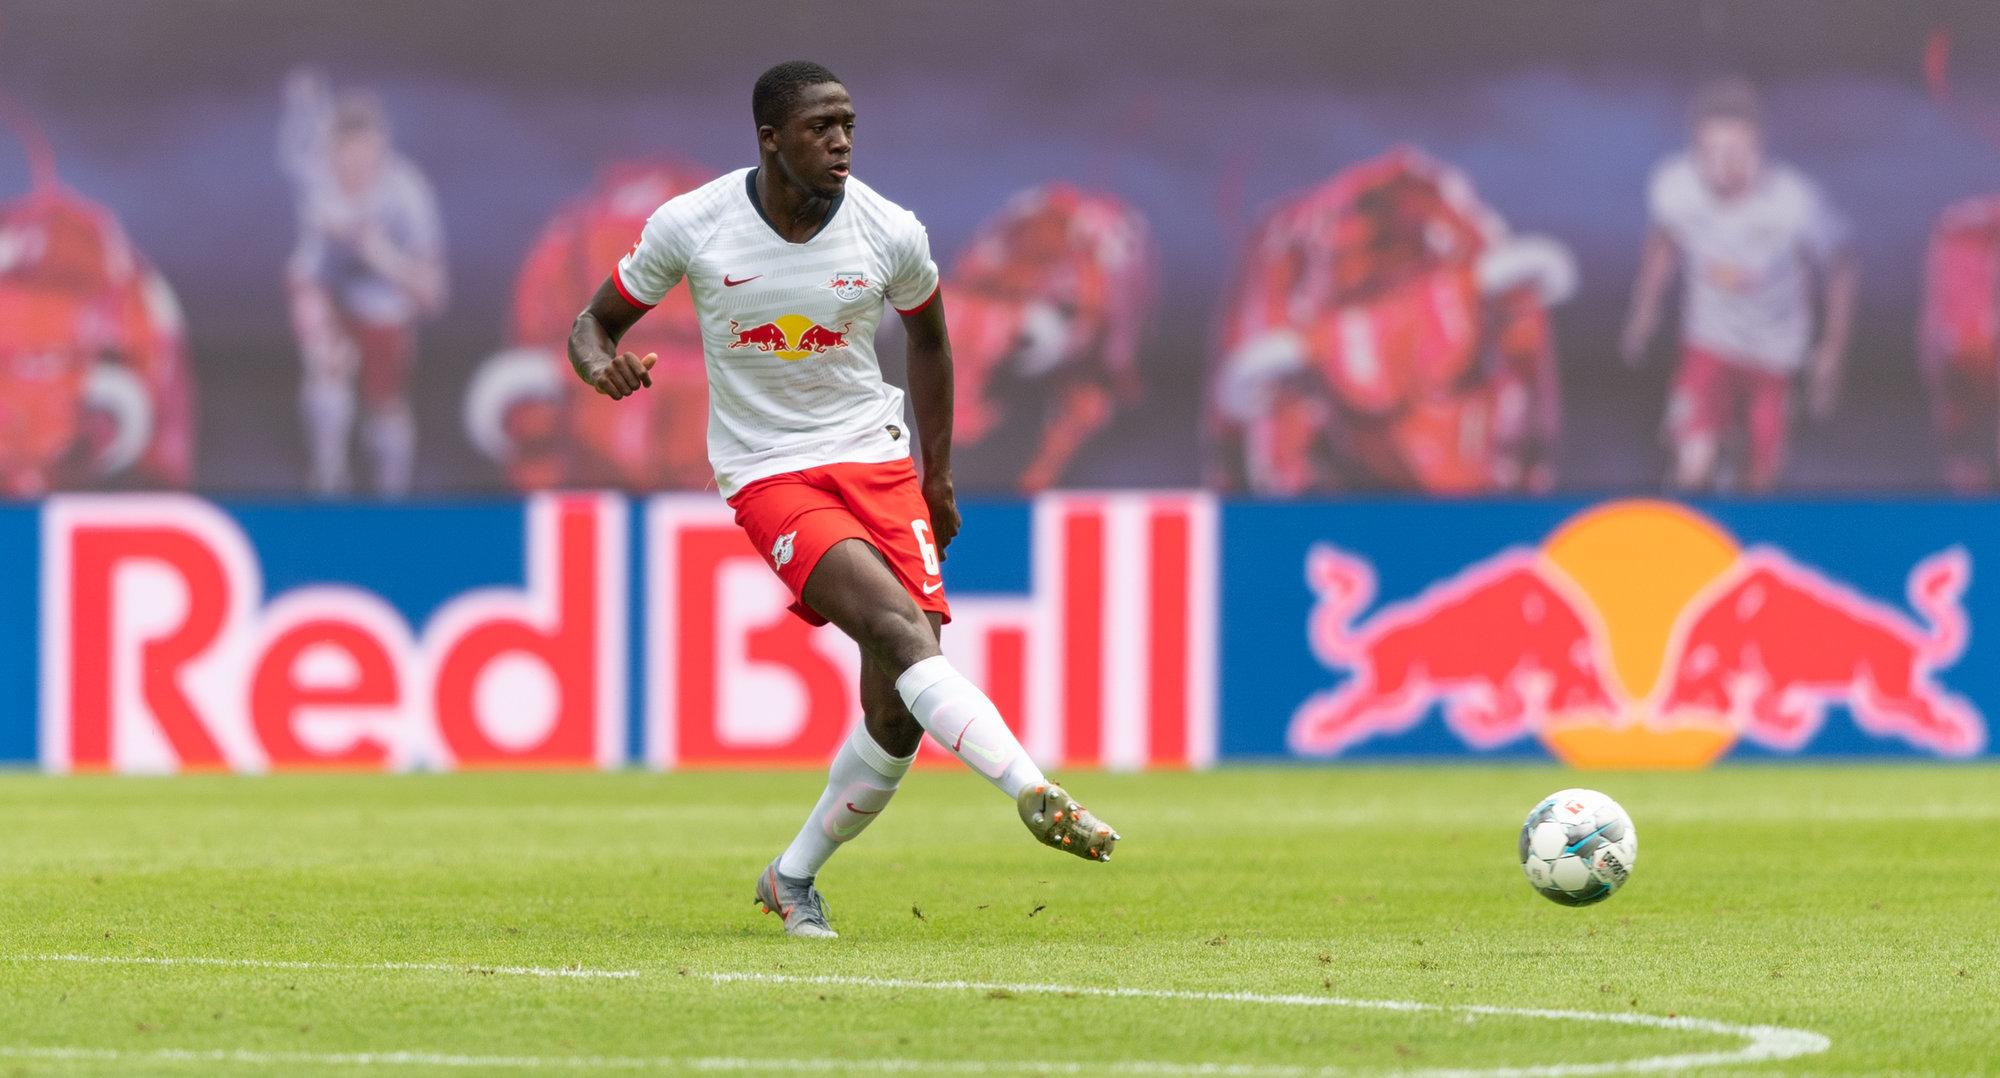 «Ливерпуль», «МЮ» и «Челси» претендуют на защитника «Лейпцига» Конате